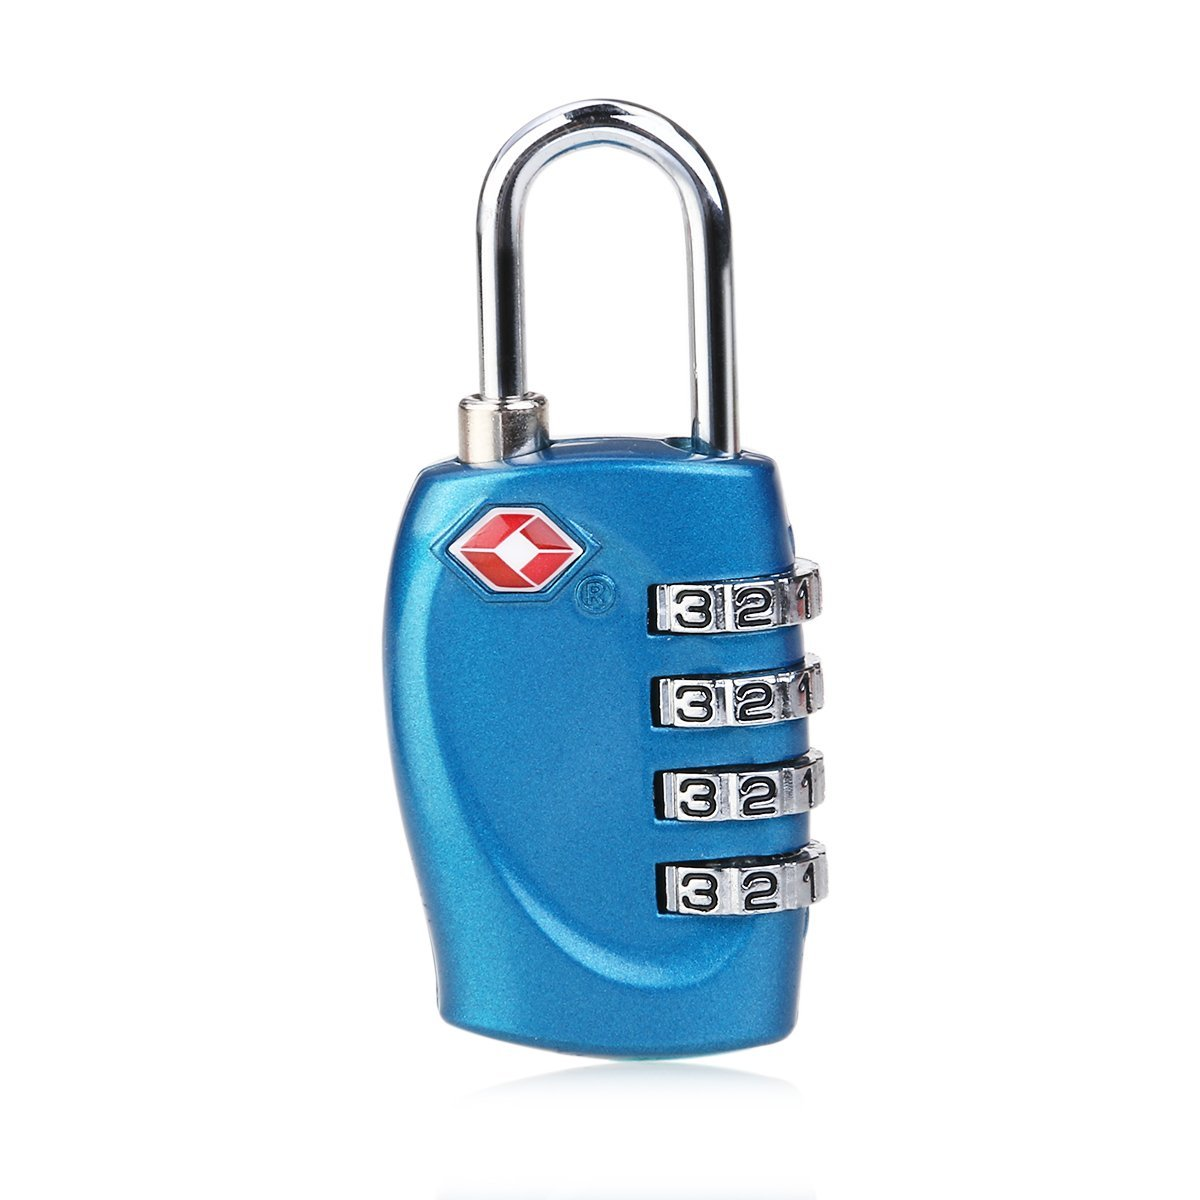 WINOMO TSA-330 TSA Approved Security Luggage Padlock 4-Digit Combination Password Lock Padlock (Blue)